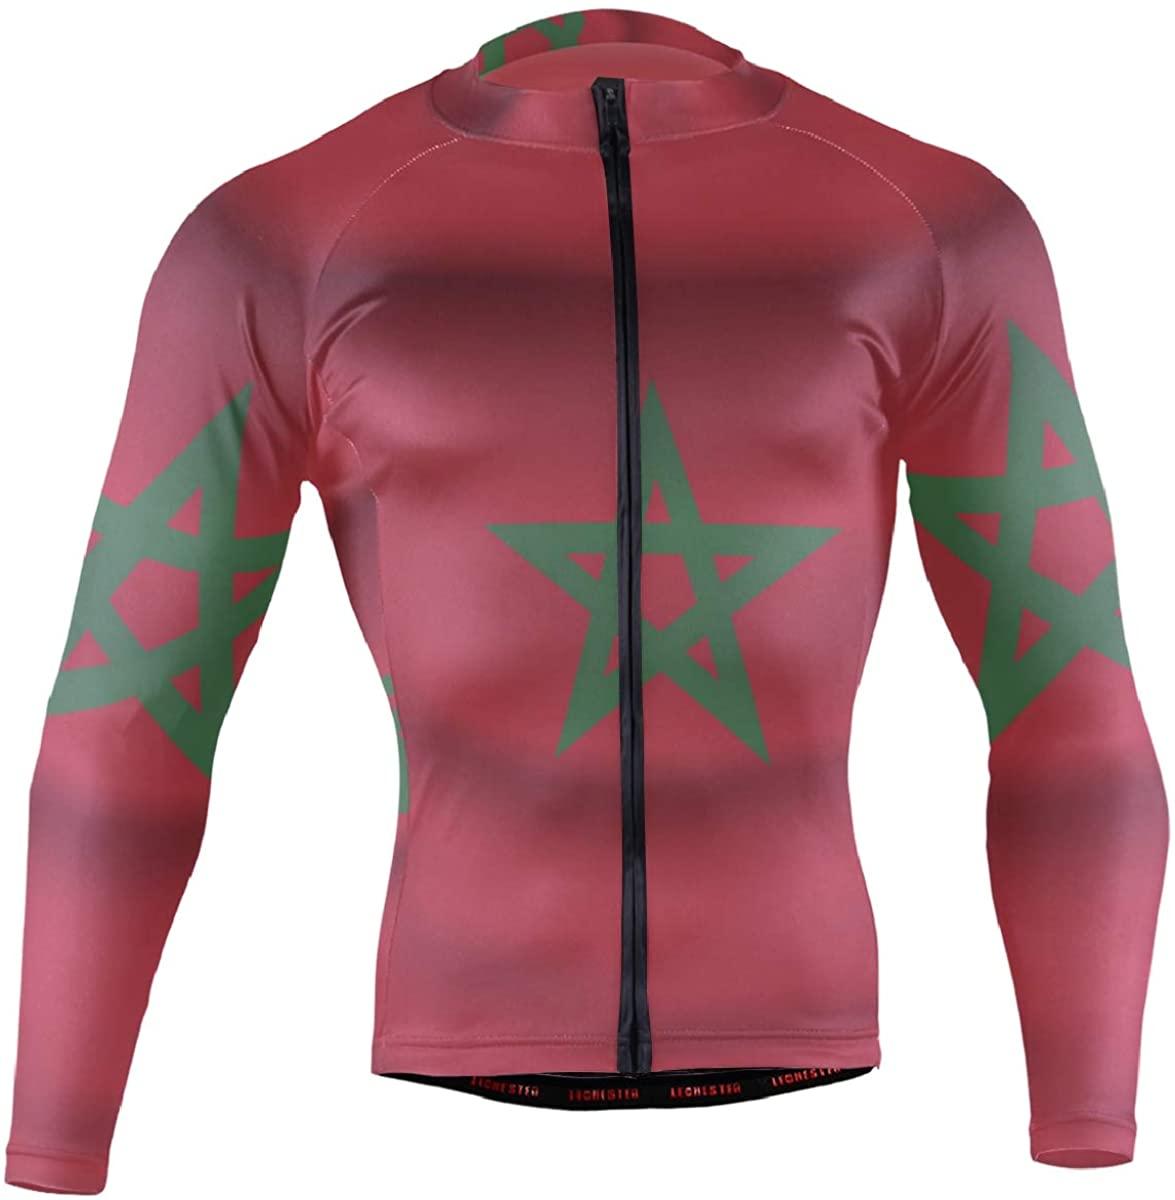 Morocco Flag Mens Cycling Jerseys Biking Shirts Long Sleeve Bike Clothing Full Zipper Bicycle Jacket